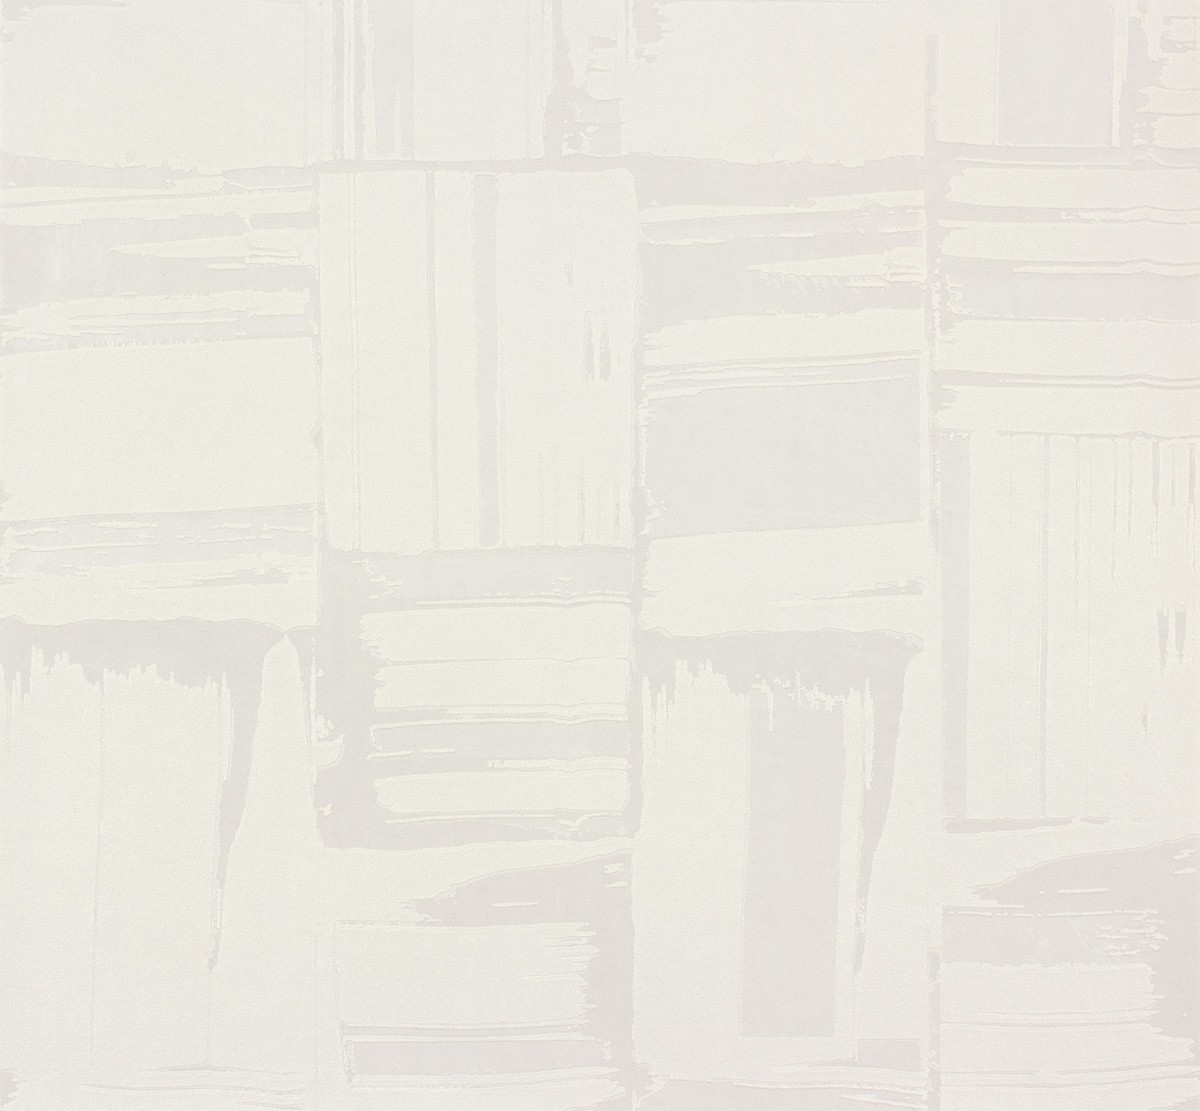 vliestapete wei grafisch struktur ps 13304 10. Black Bedroom Furniture Sets. Home Design Ideas